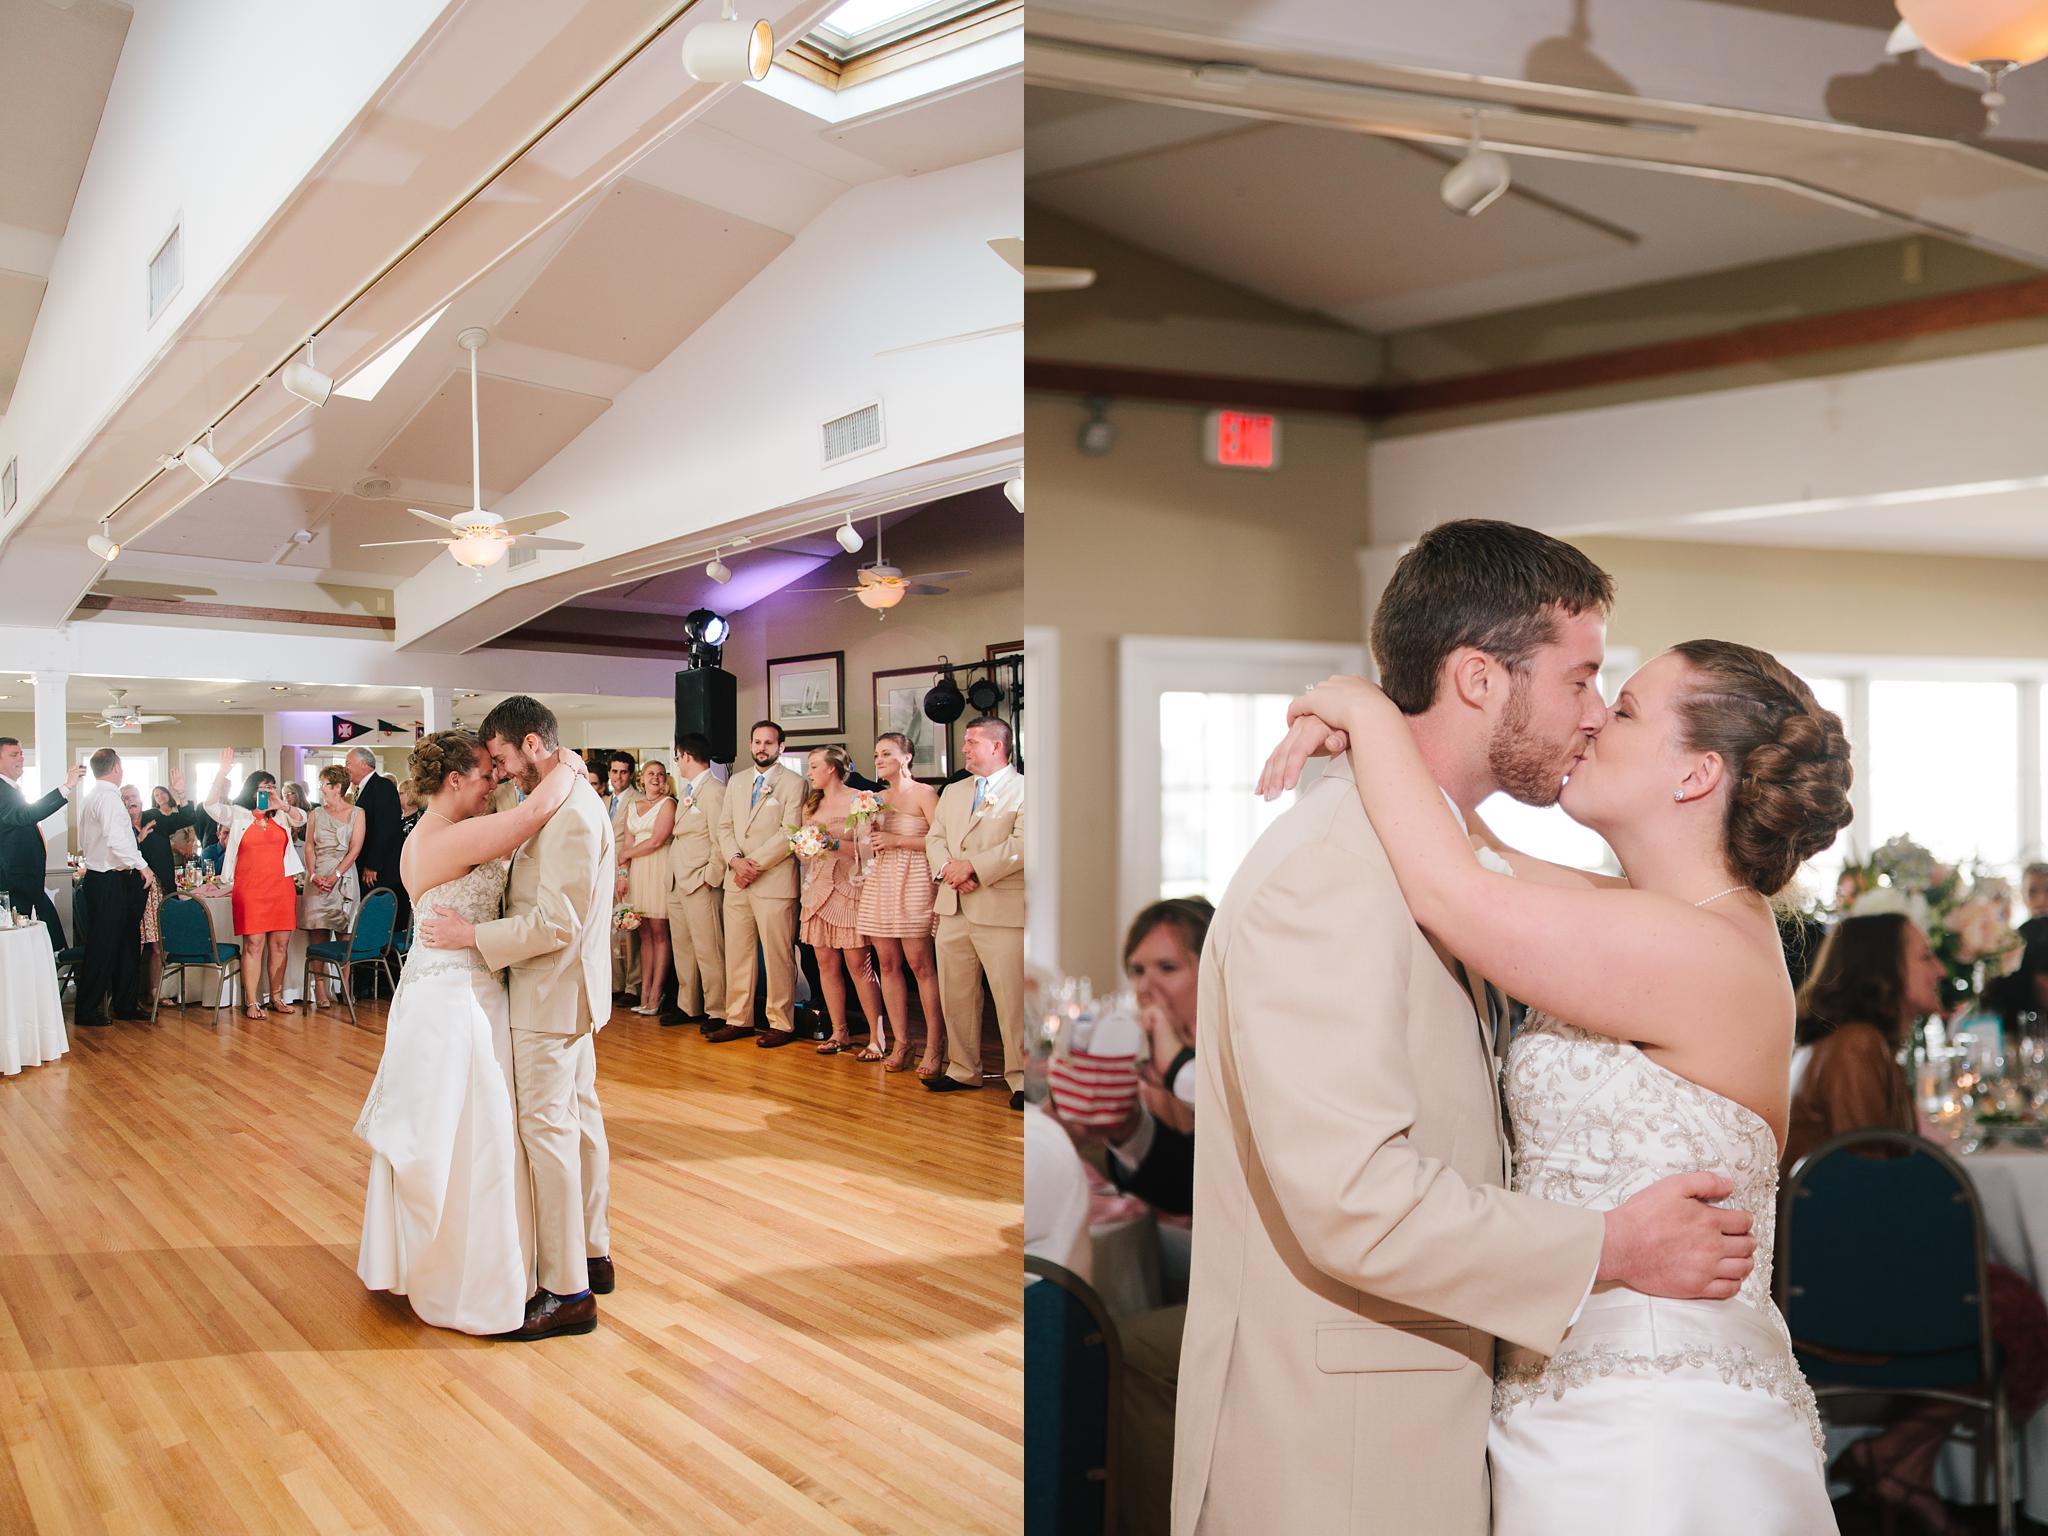 brant_beach_yacht_club_wedding_long_beach_island_nj_wedding_photographer_752.jpg